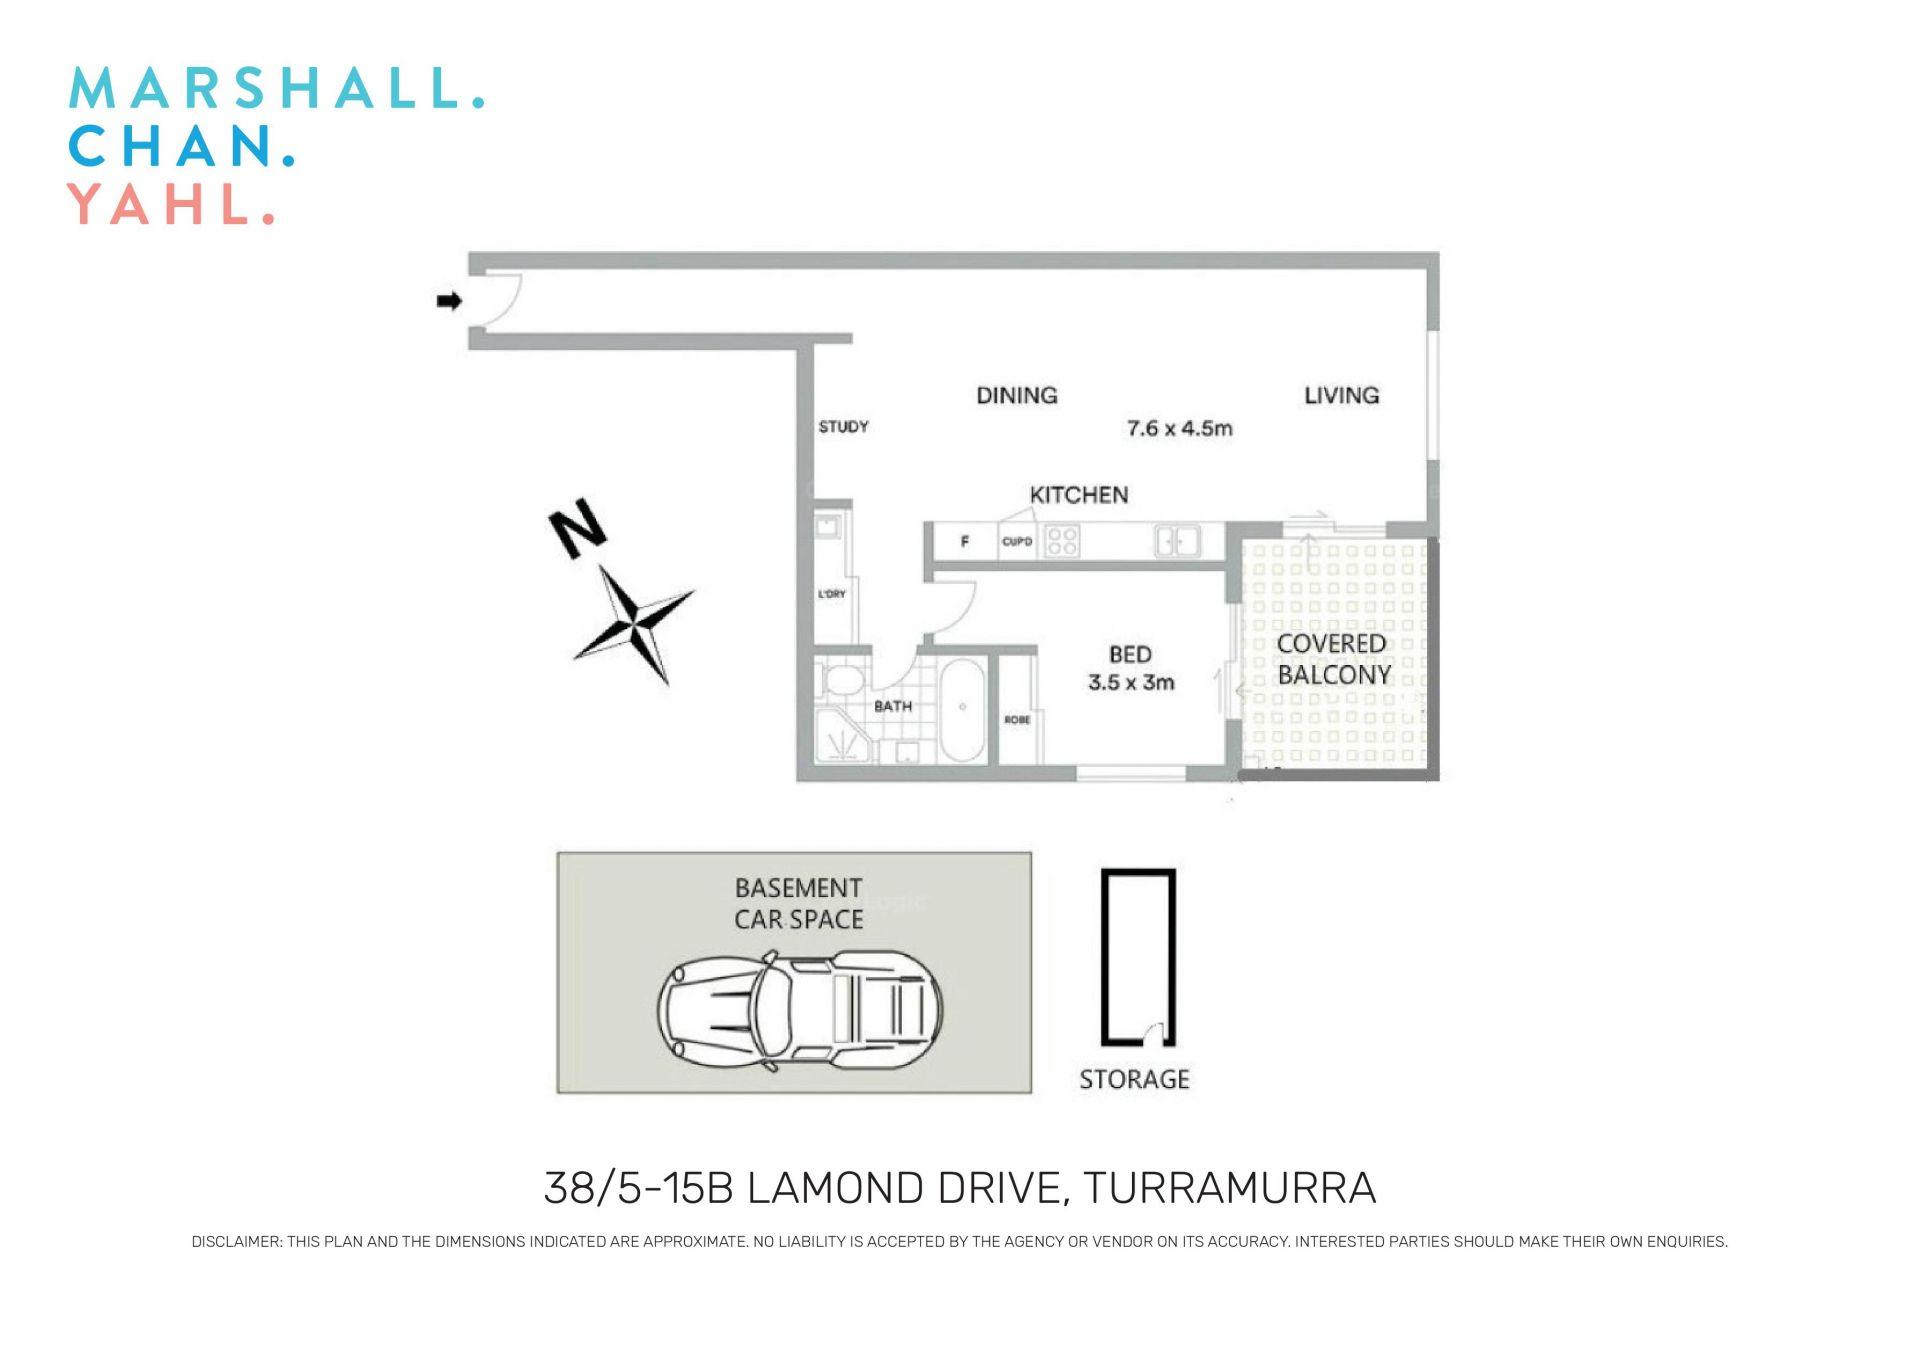 38/5-15B Lamond Drive Turramurra 2074